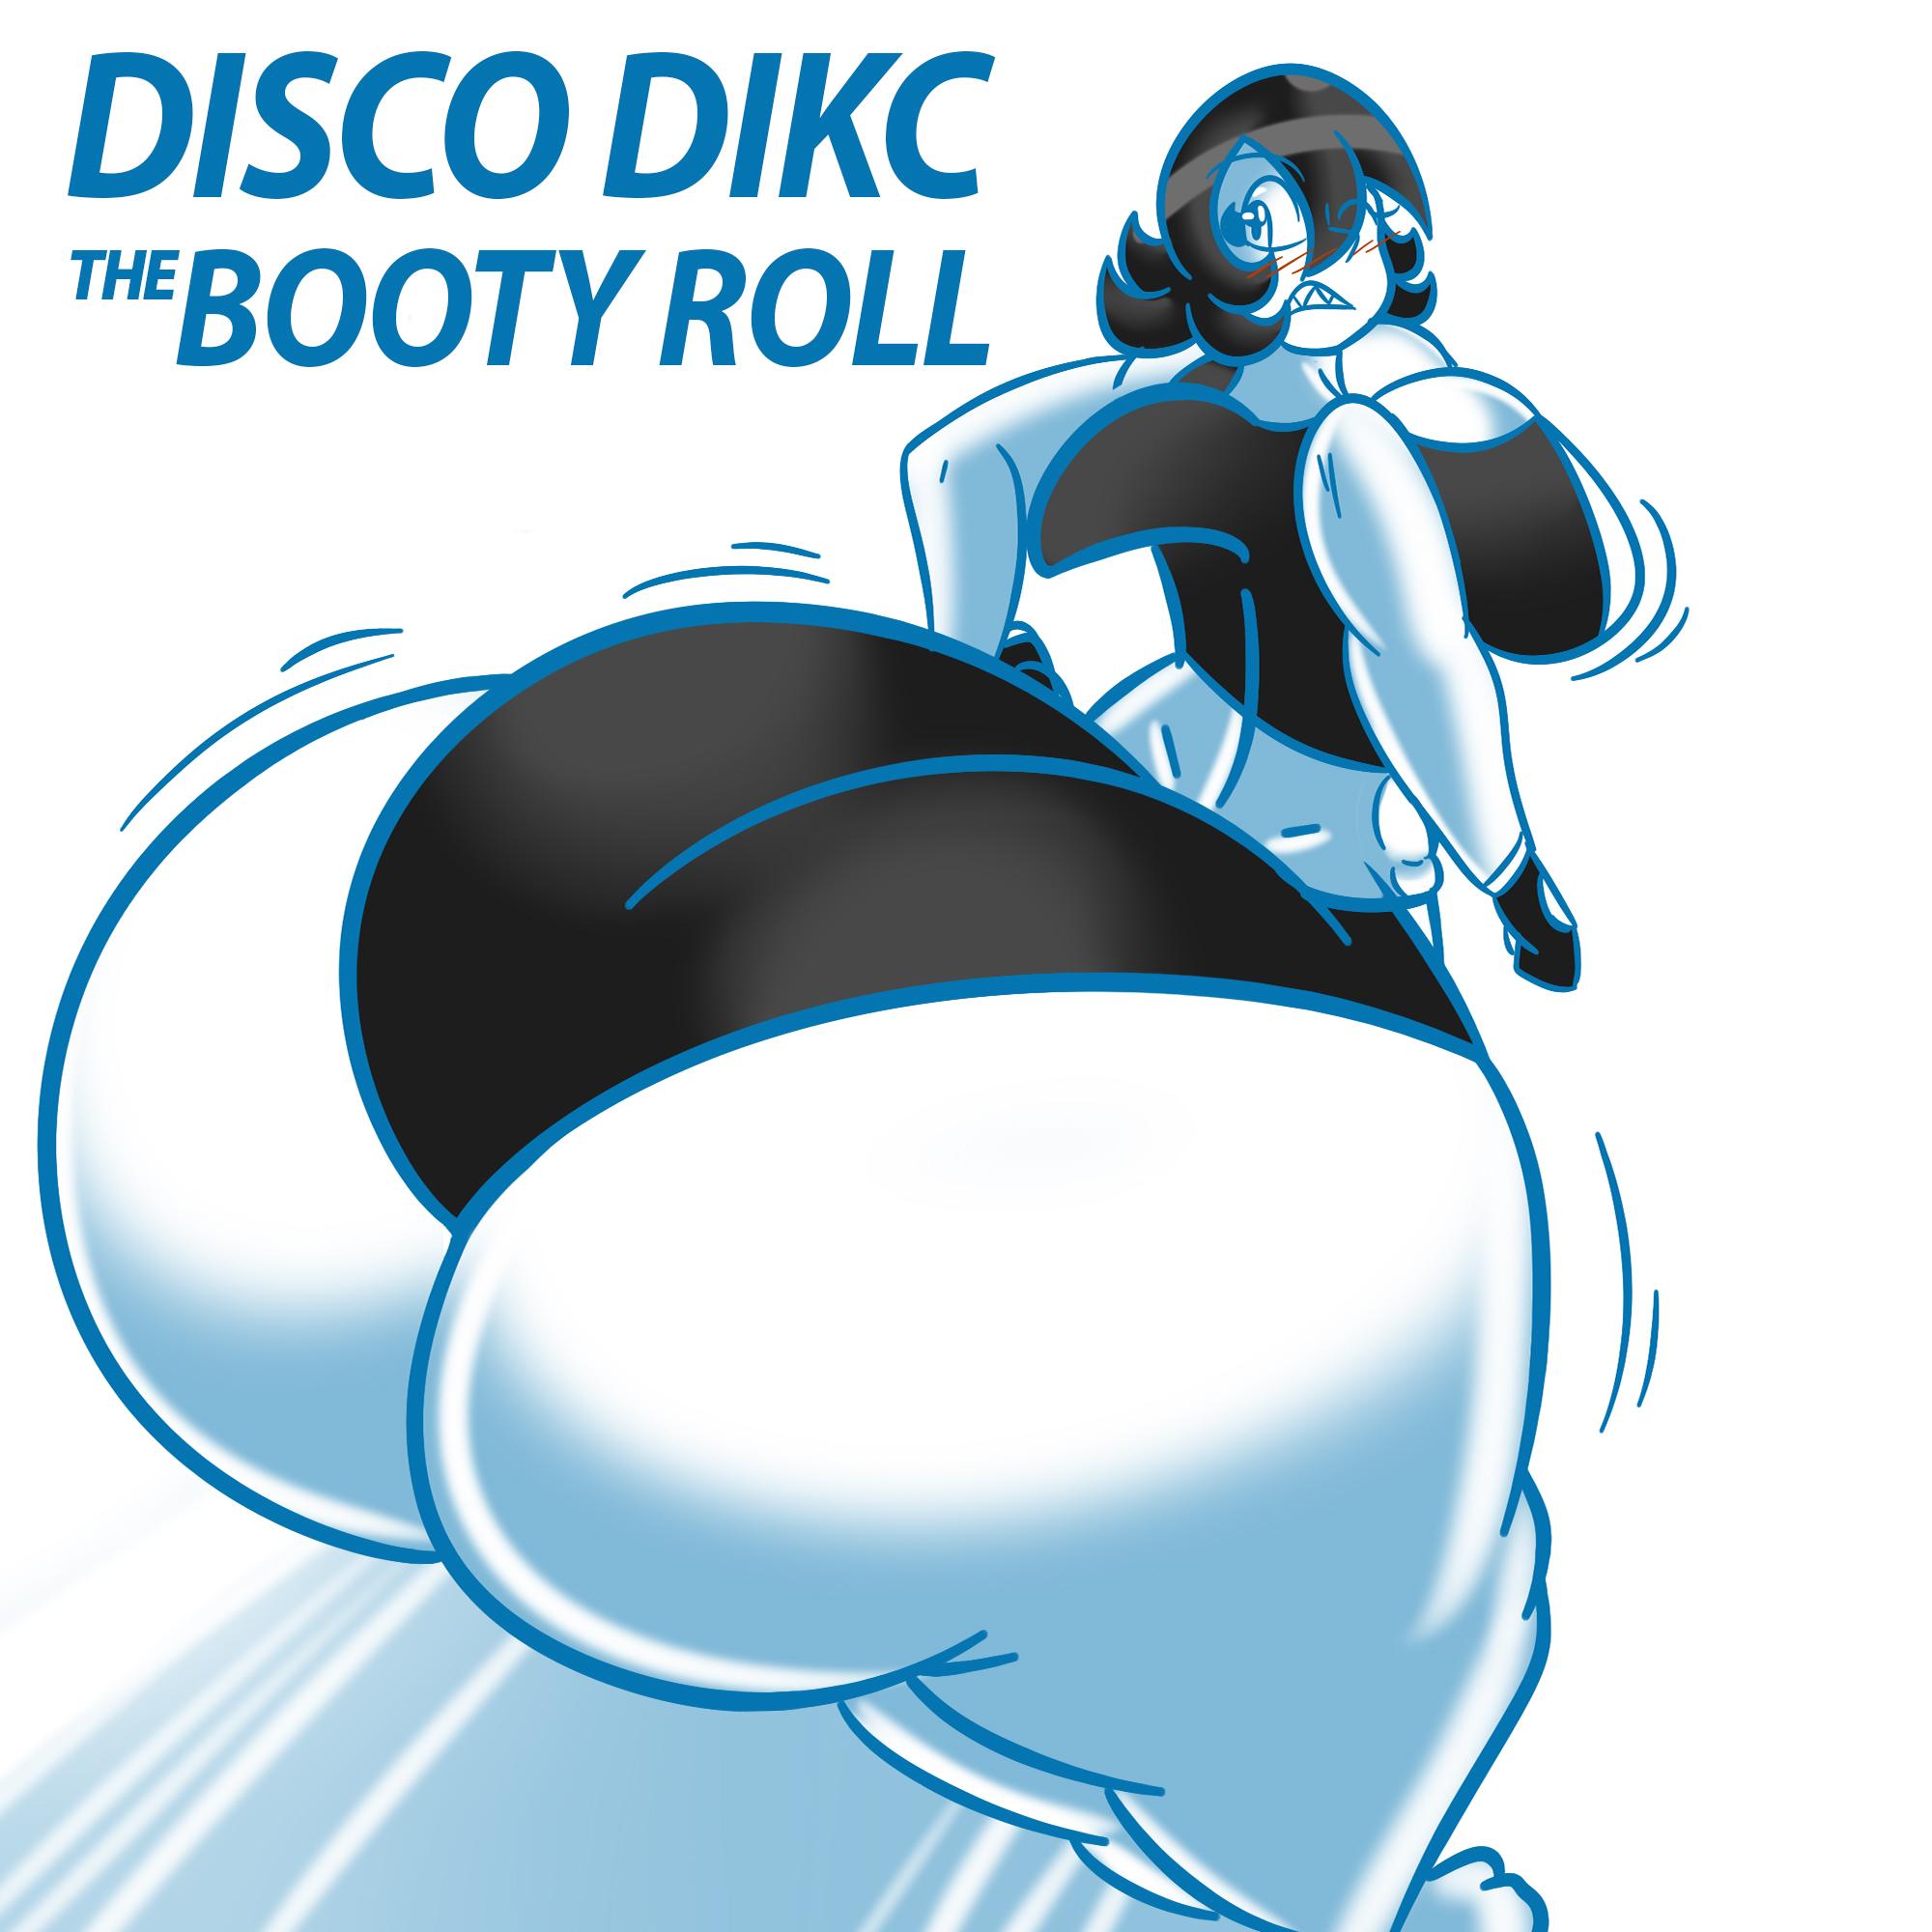 [OFDM019] DISCO DIKC - The Booty Roll.jpg